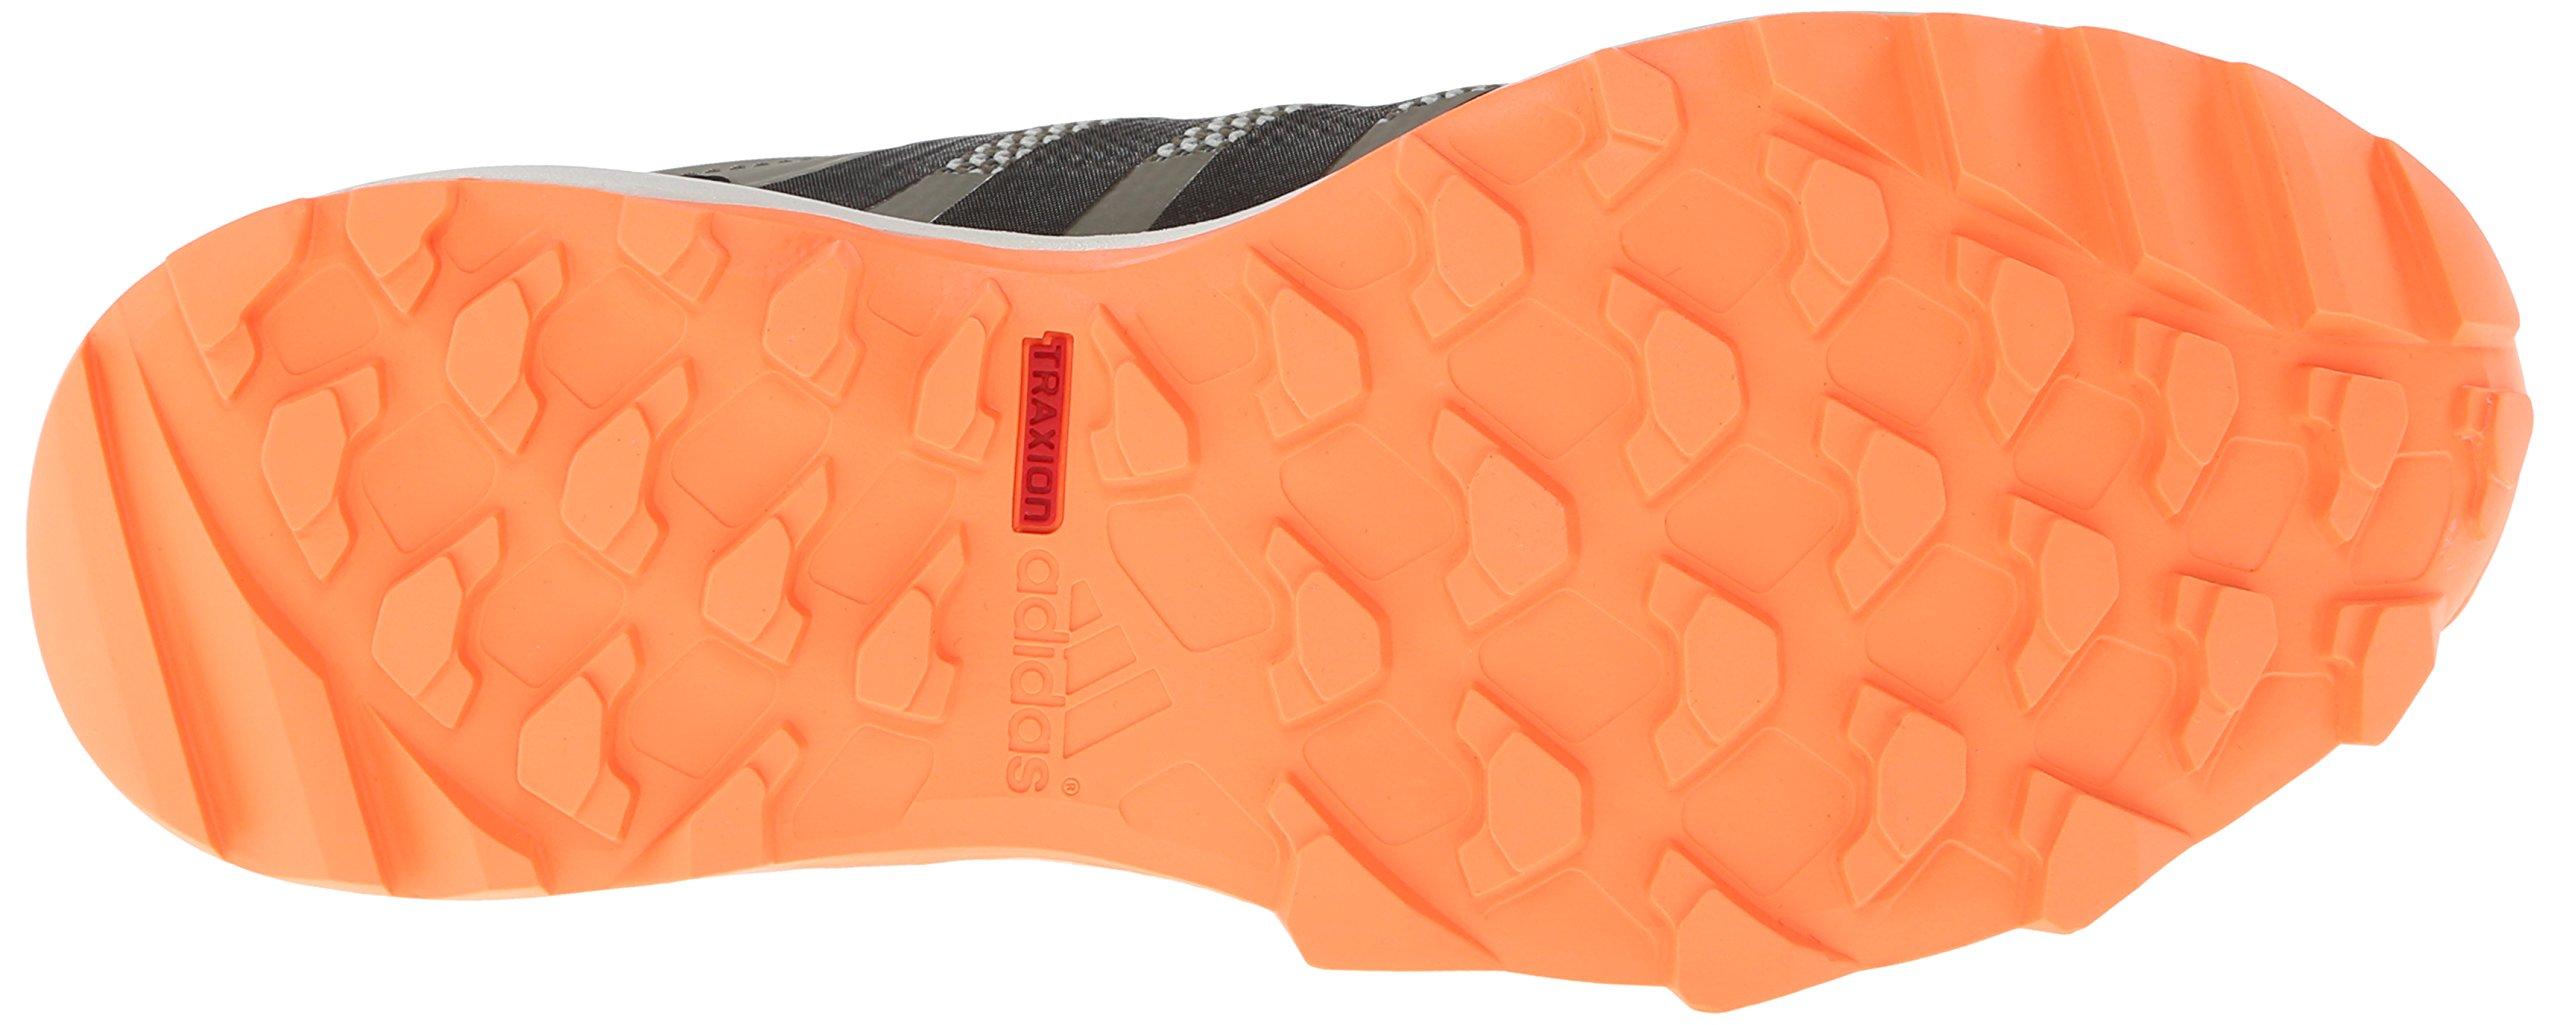 adidas Performance Women's Kanadia 7 TR W Trail Running Shoe, Clay/Chalk/Flash Orange, 7 M US by adidas (Image #3)